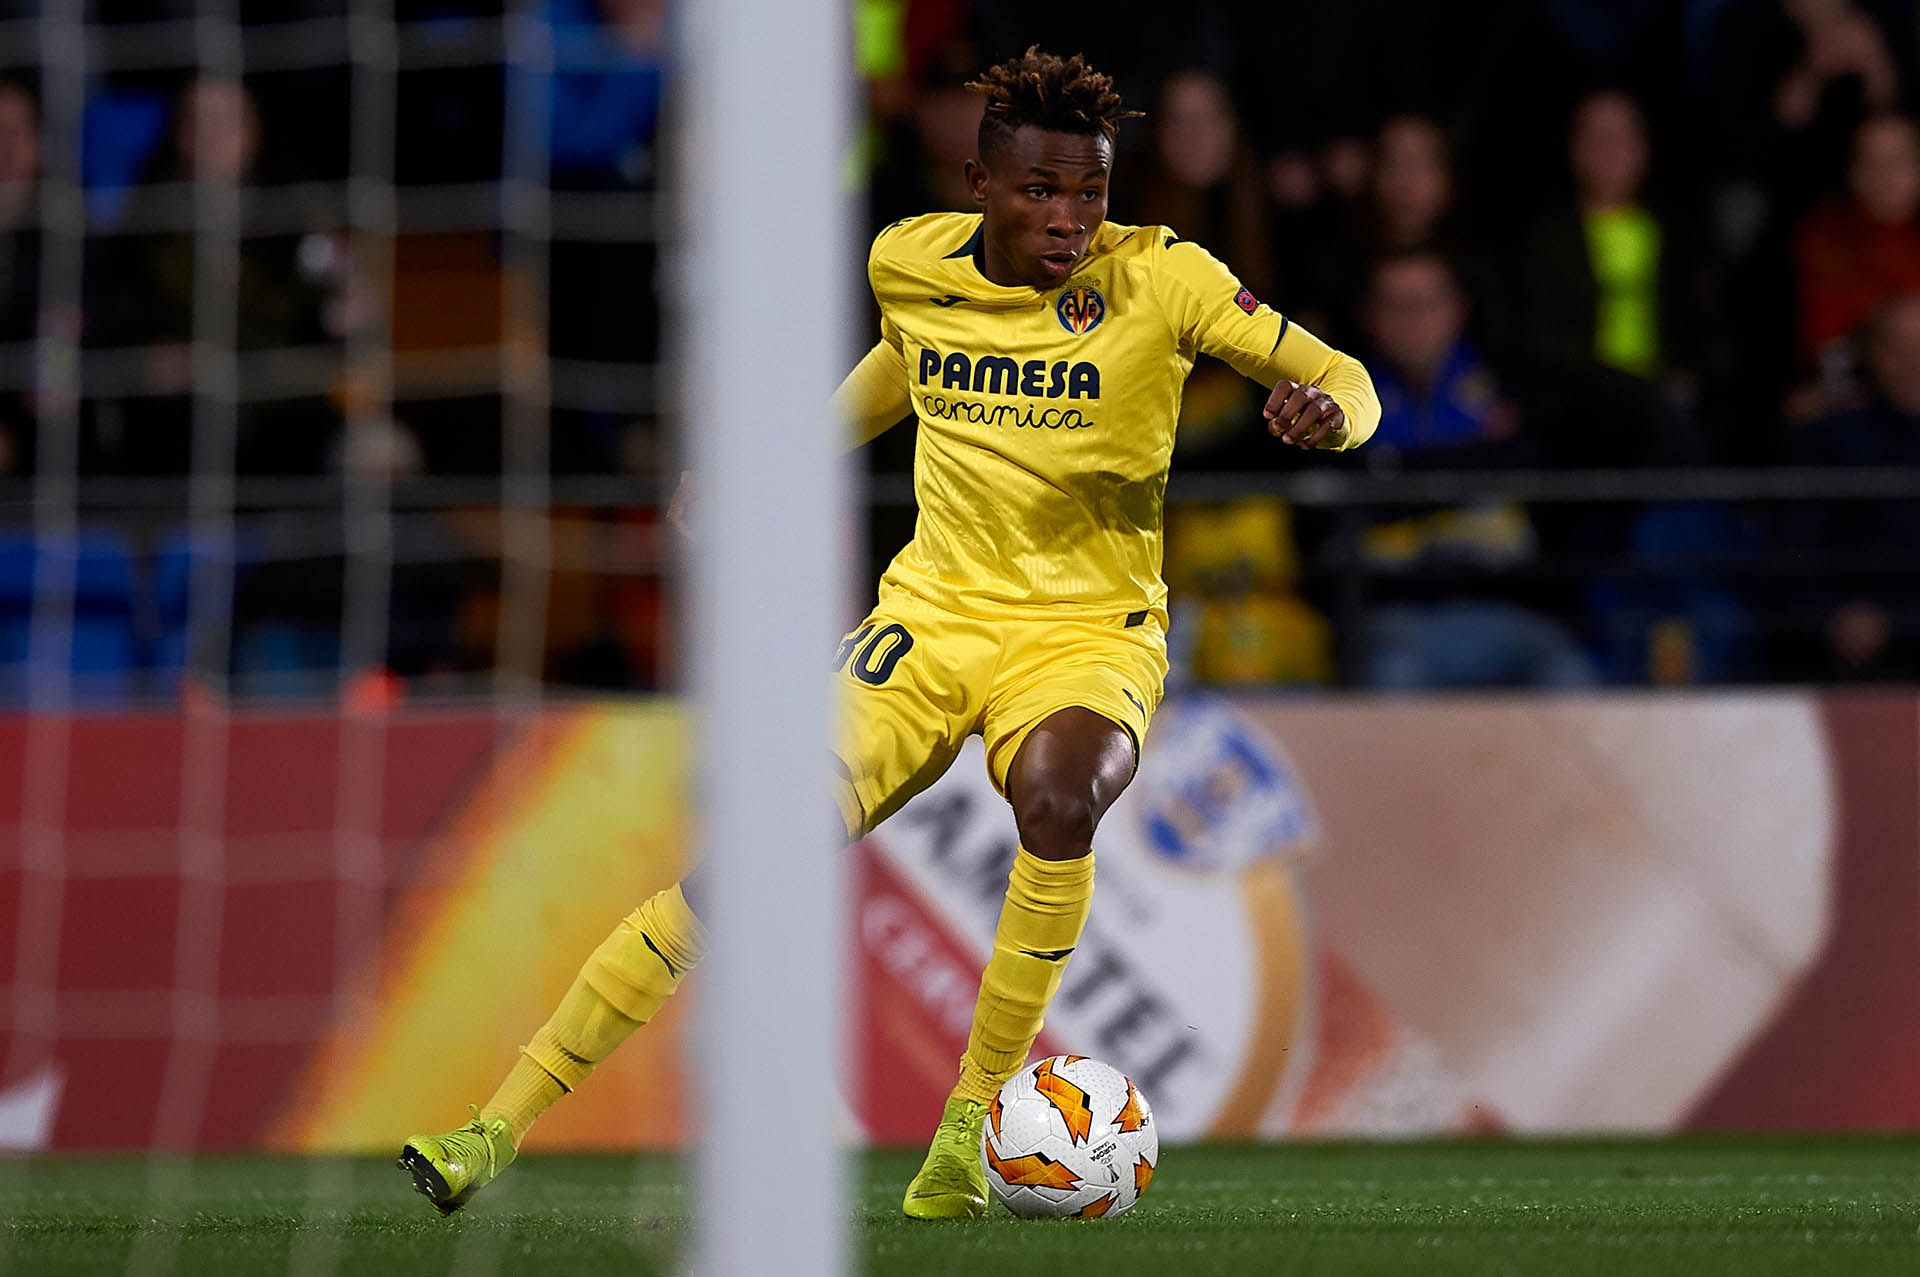 El nigeriano Samuel Chukwueze (Villarreal) USD 36,2 millones